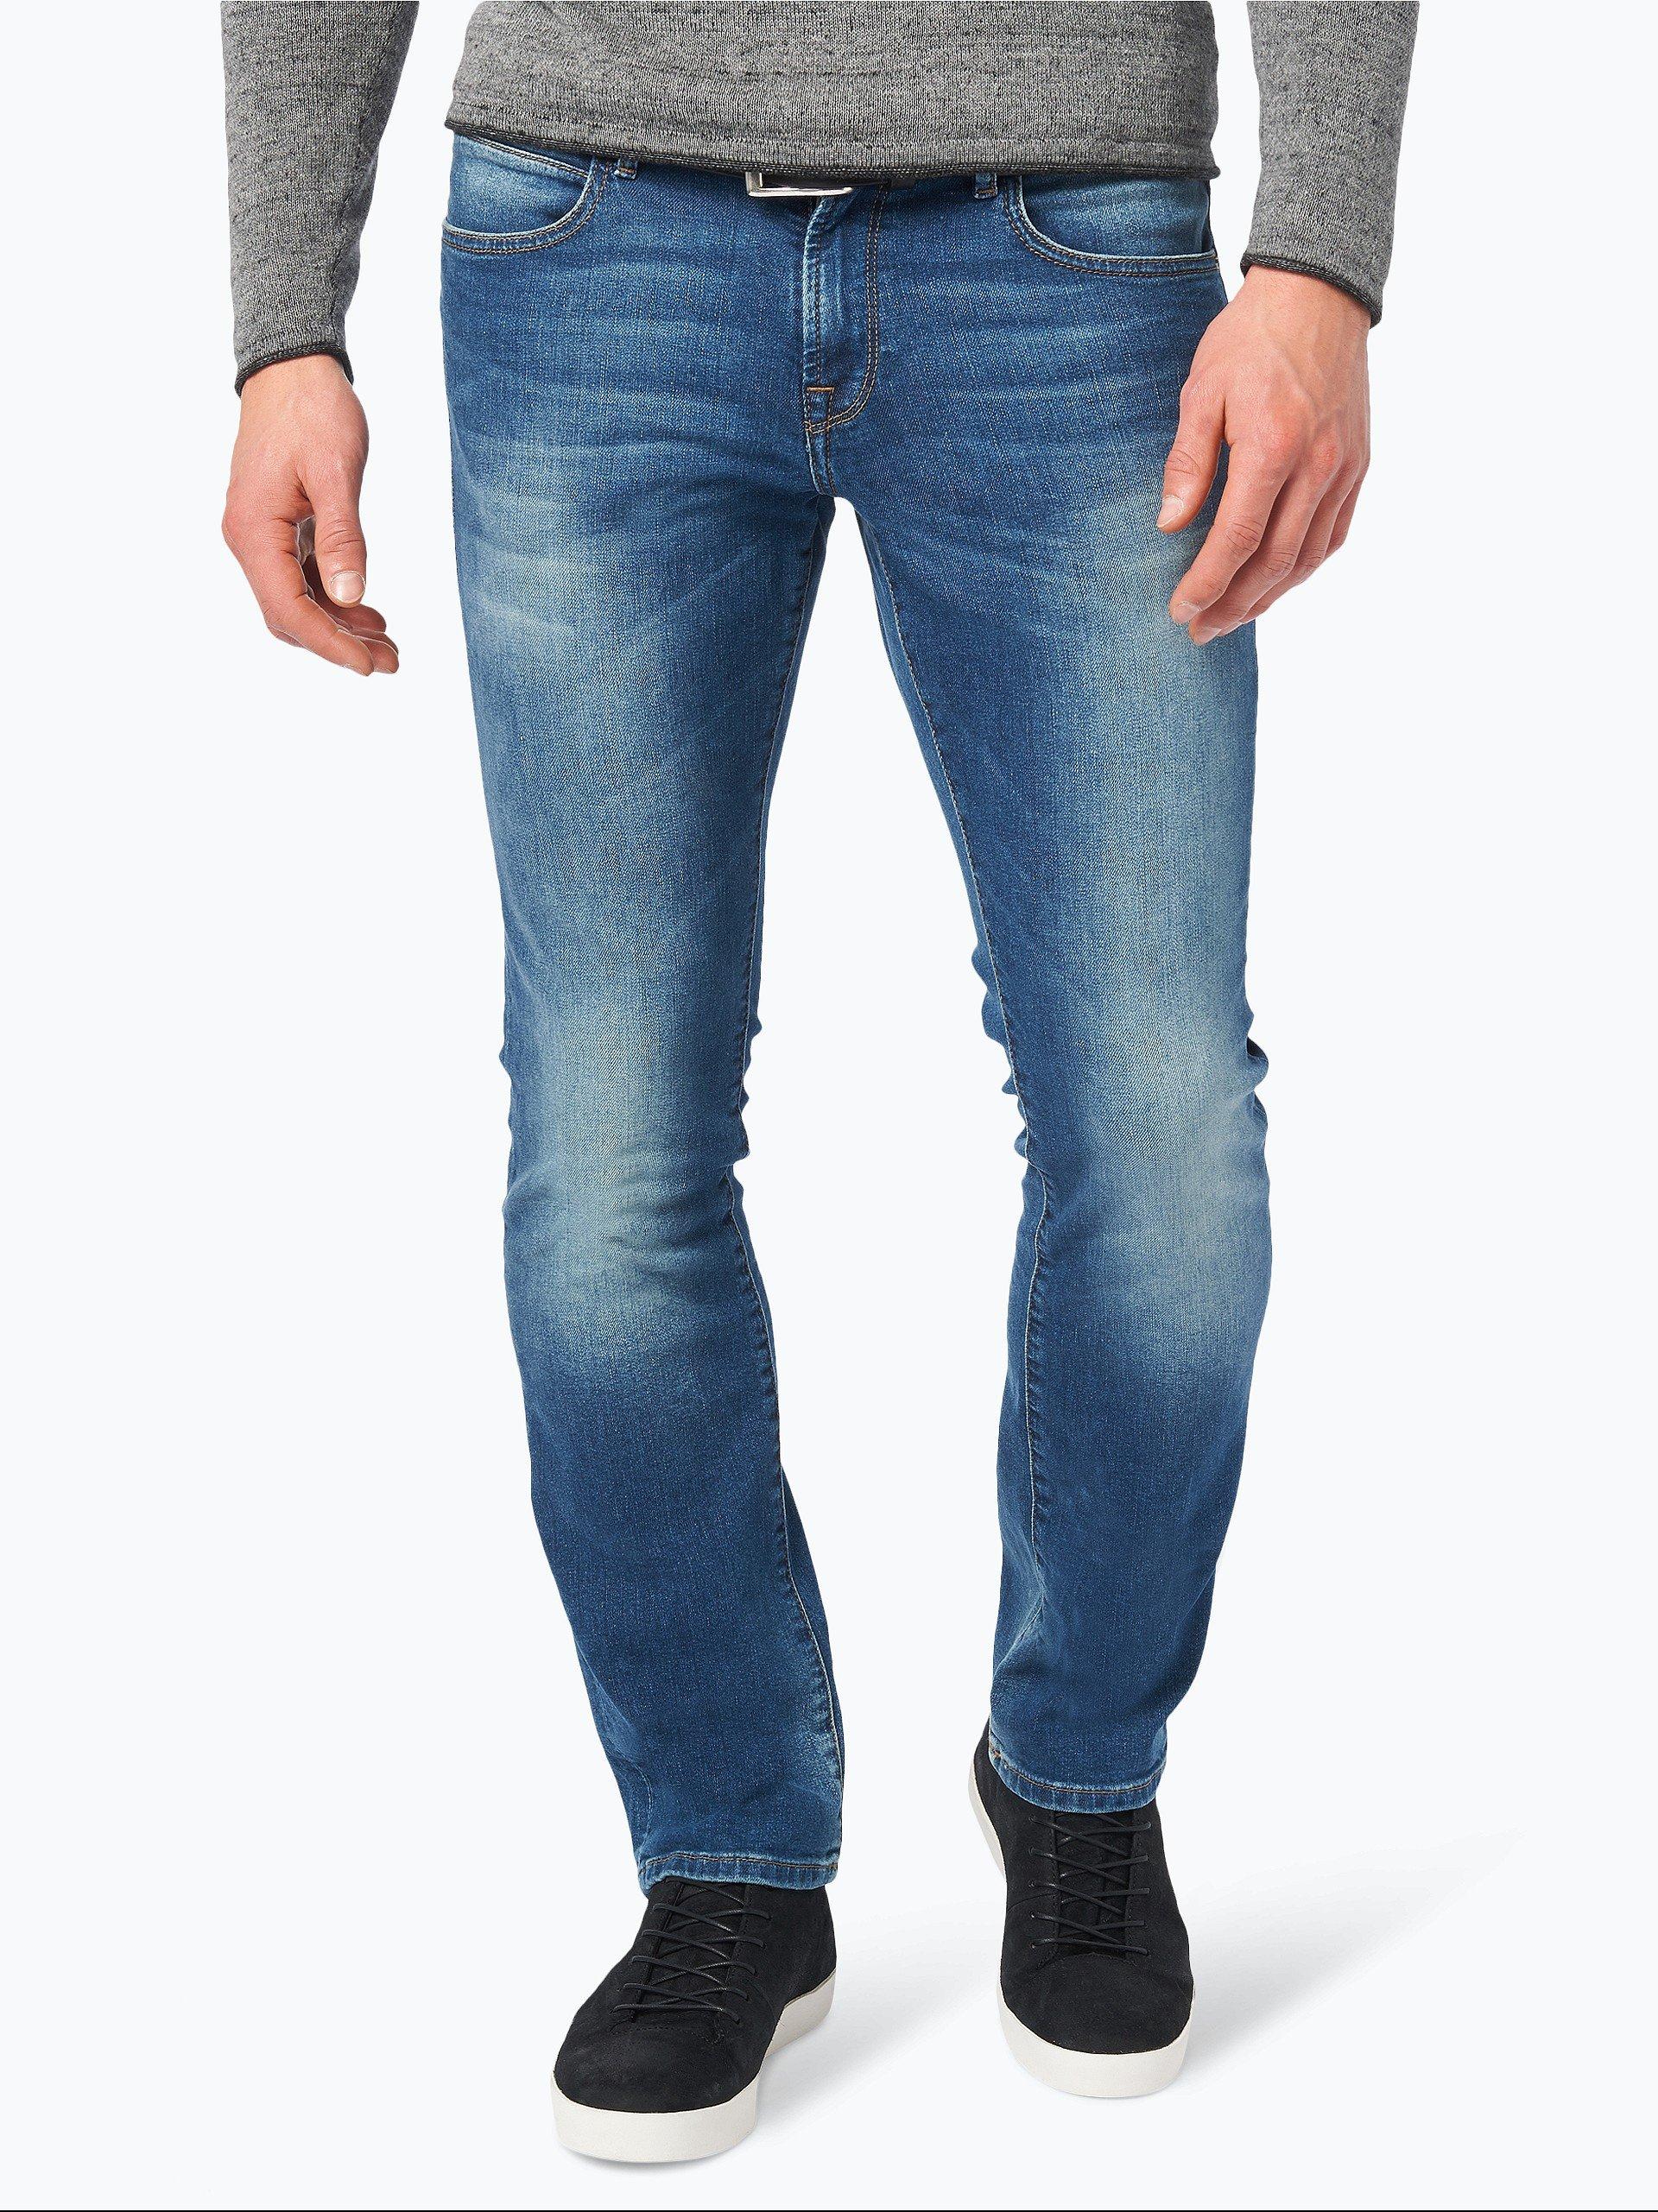 boss casual herren jeans orange 24 barcelona medium stone uni online kaufen vangraaf com. Black Bedroom Furniture Sets. Home Design Ideas